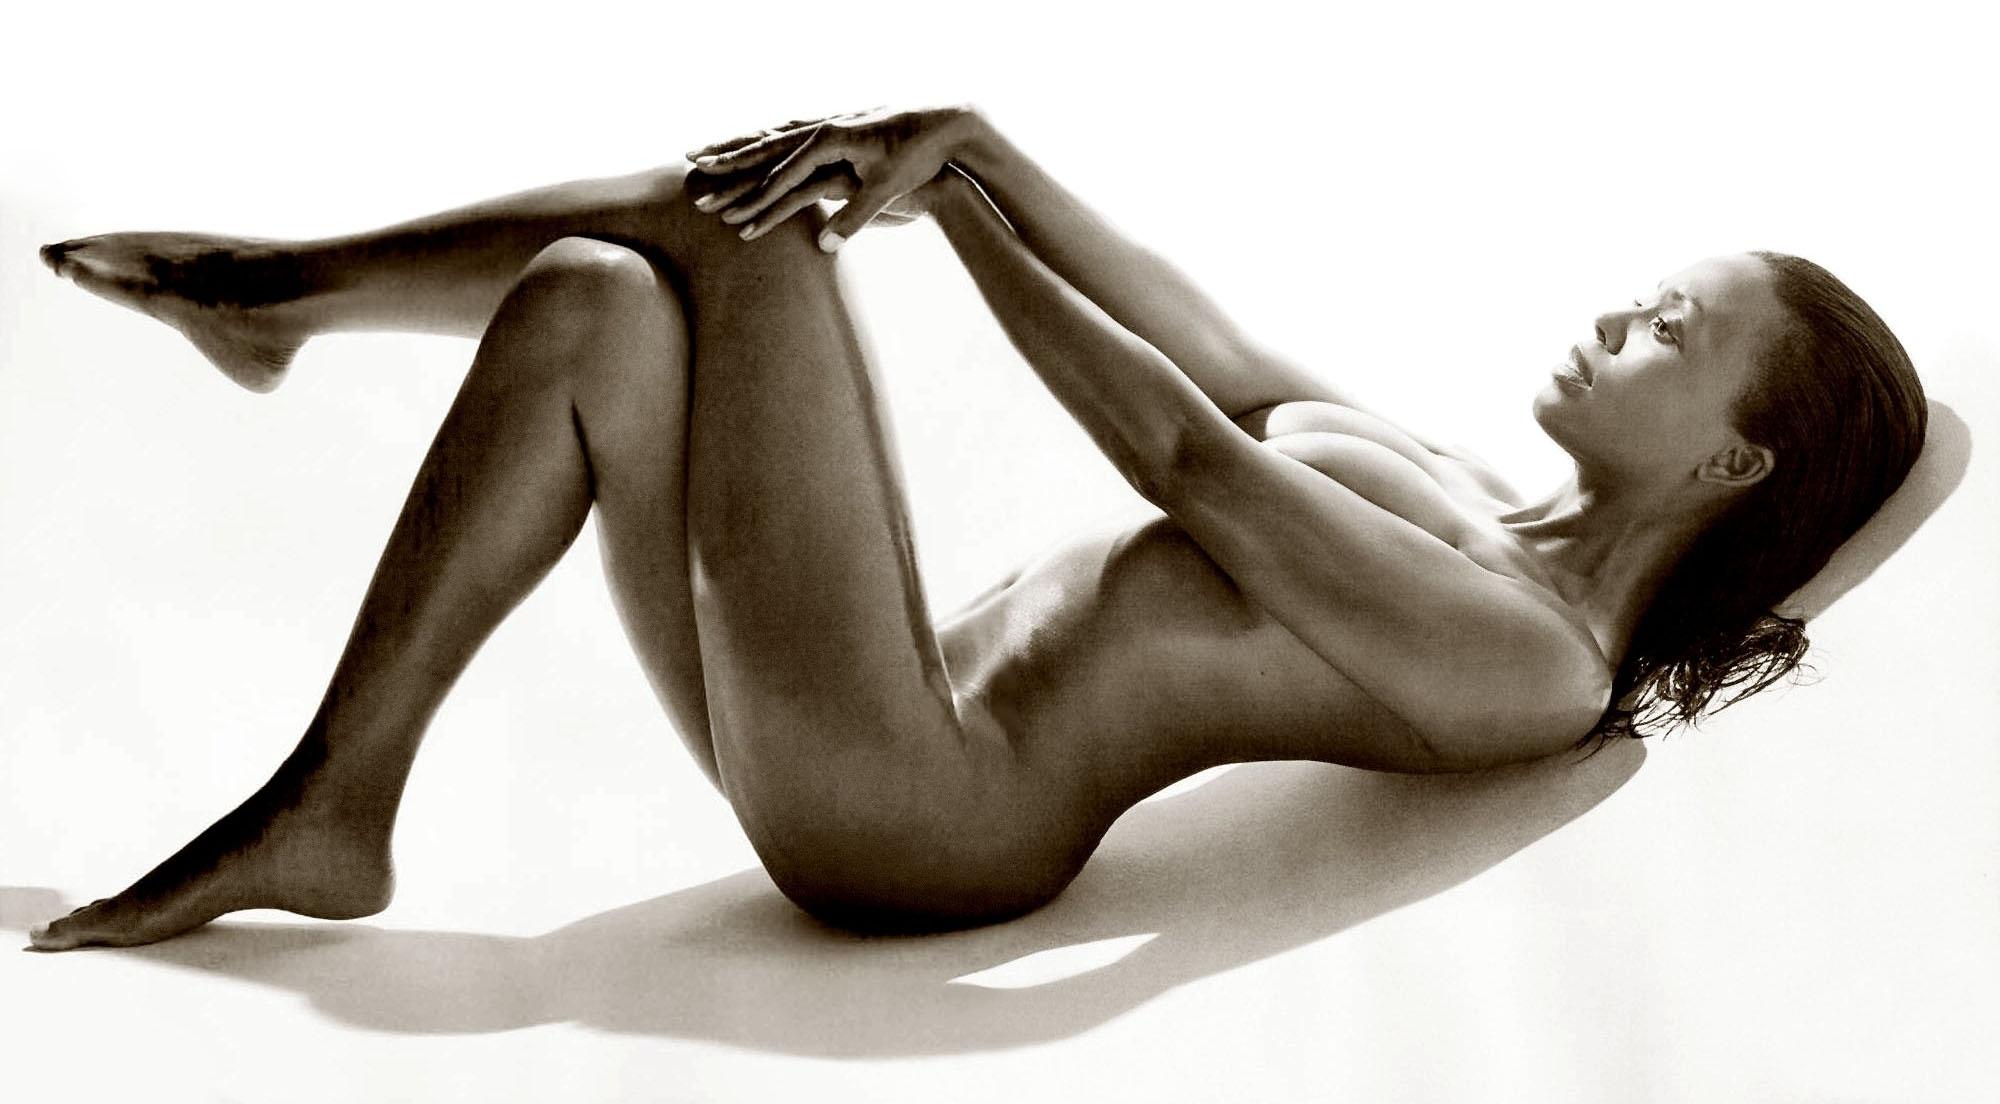 Aisha tyler nude, fappening, sexy photos, uncensored